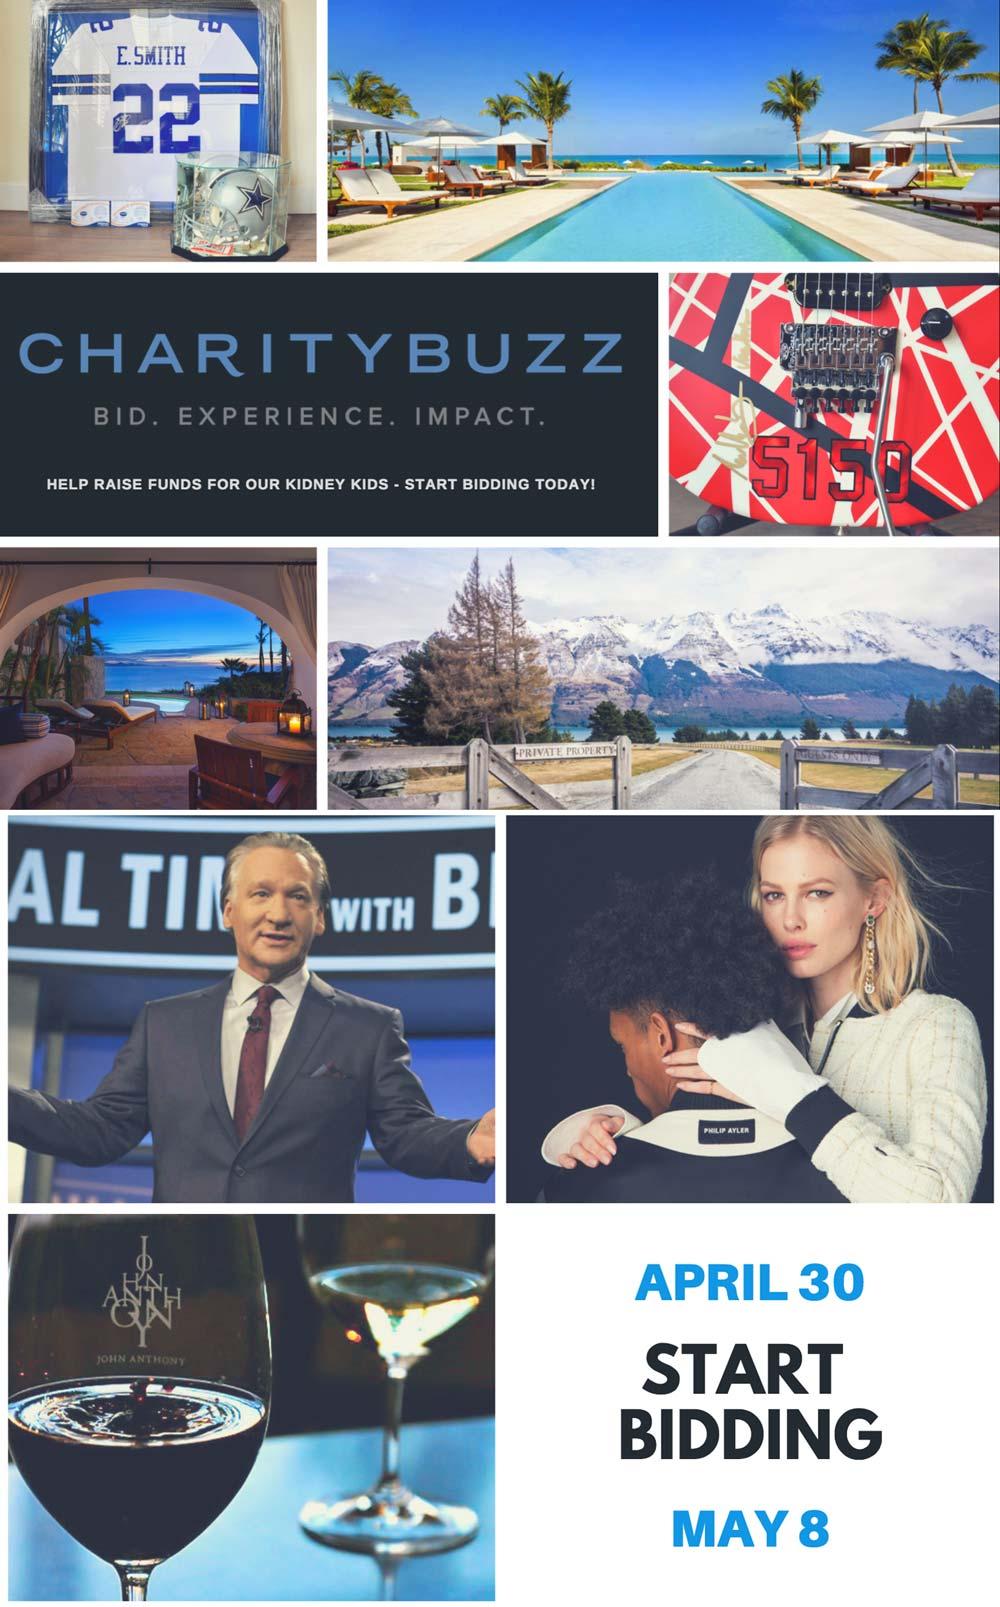 Charitybuzz 2018 George Lopez Foundation.jpg